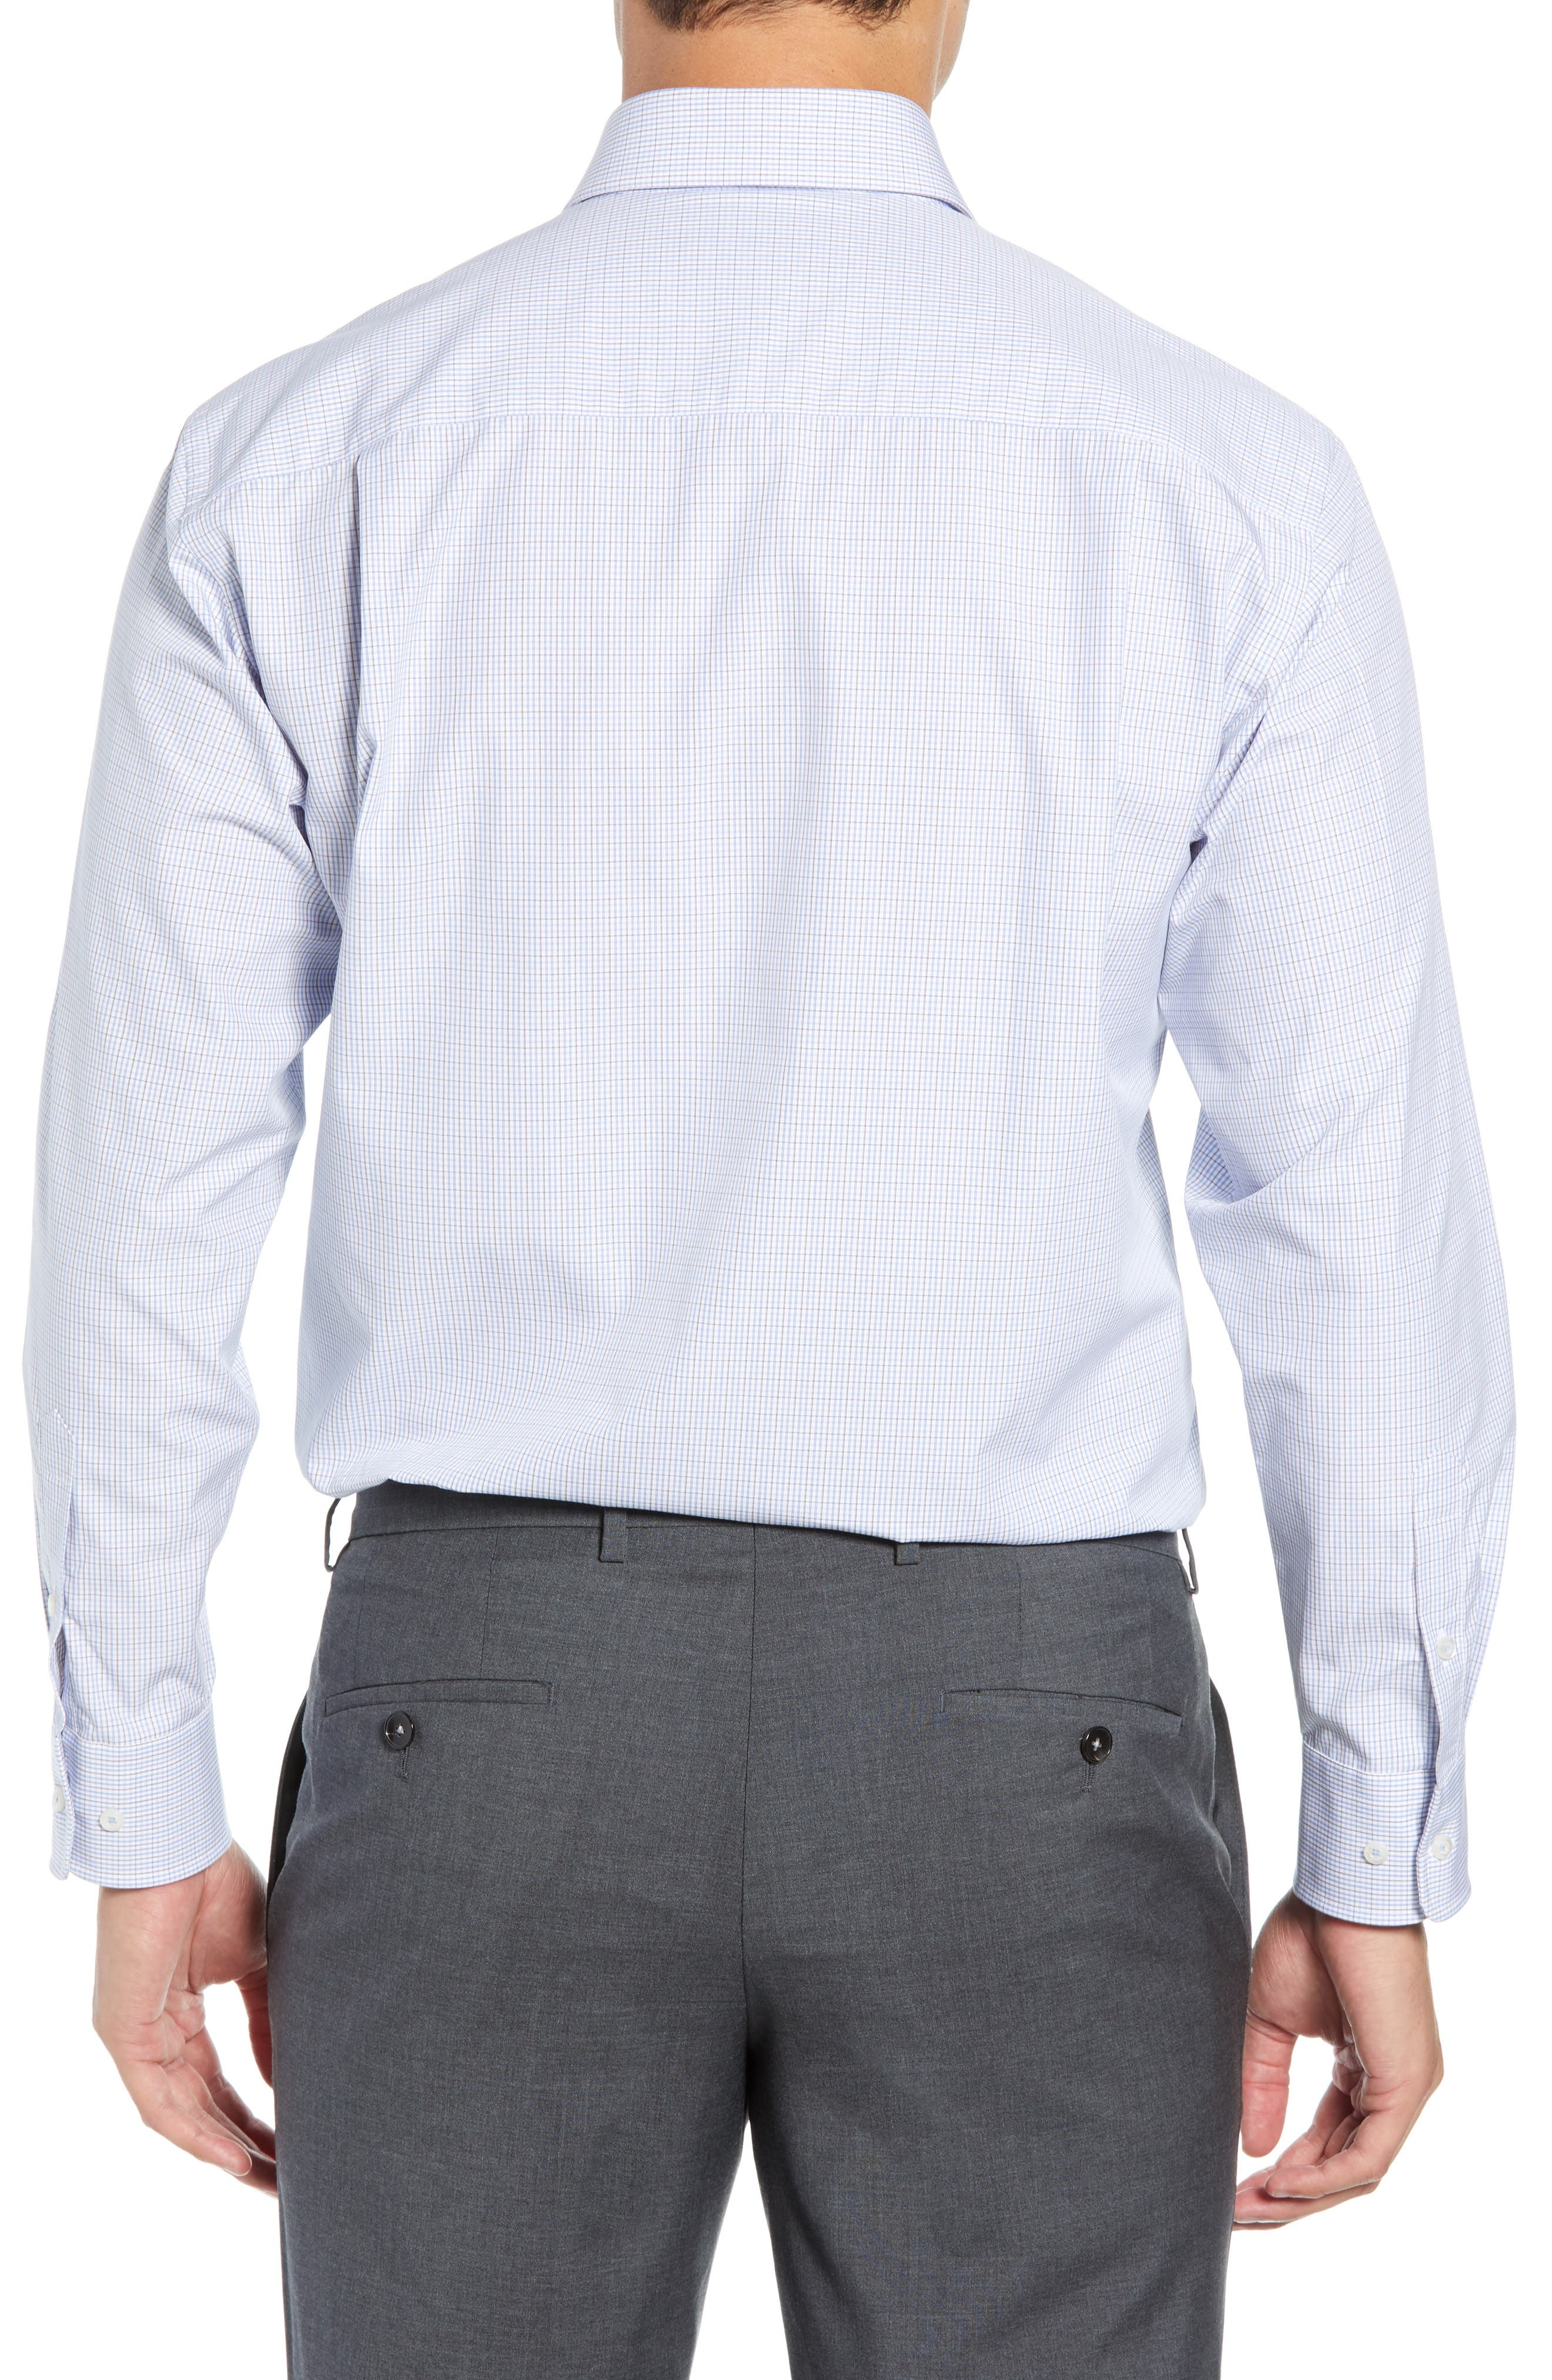 Regular Fit Check Dress Shirt,                             Alternate thumbnail 3, color,                             020